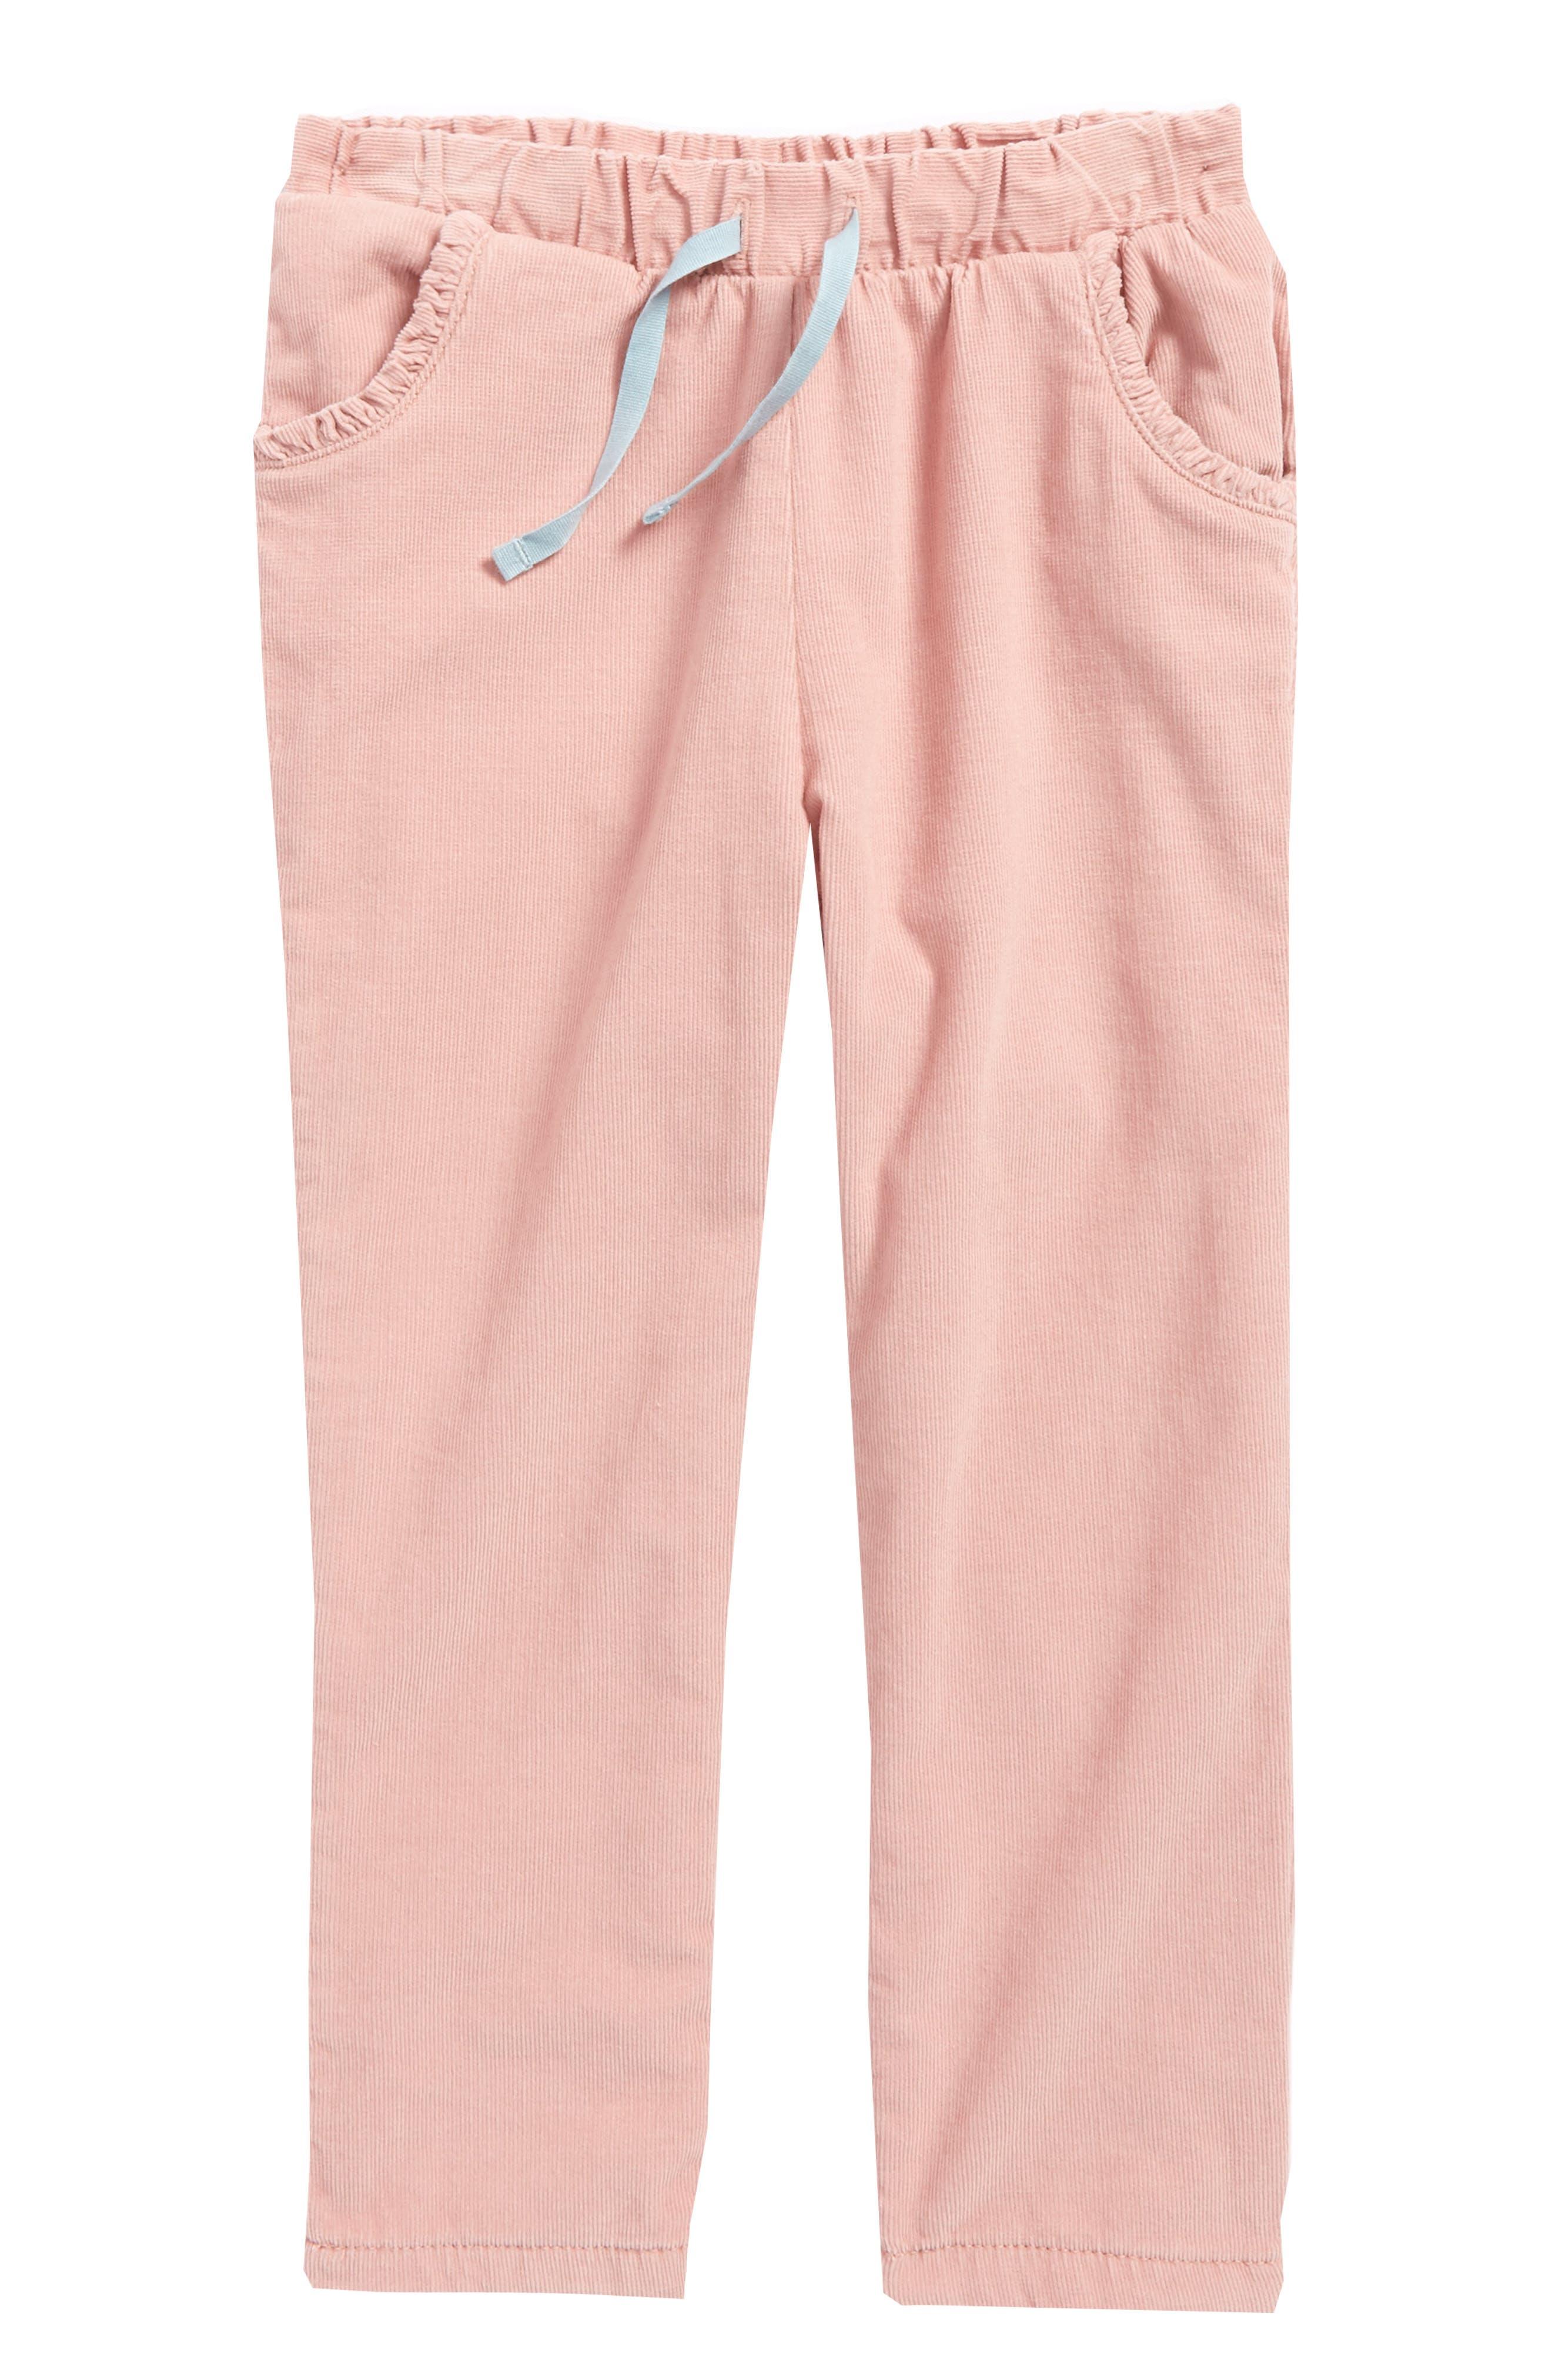 Main Image - Mini Boden Heart Pocket Corduroy Pants (Baby Girls & Toddler Girls)